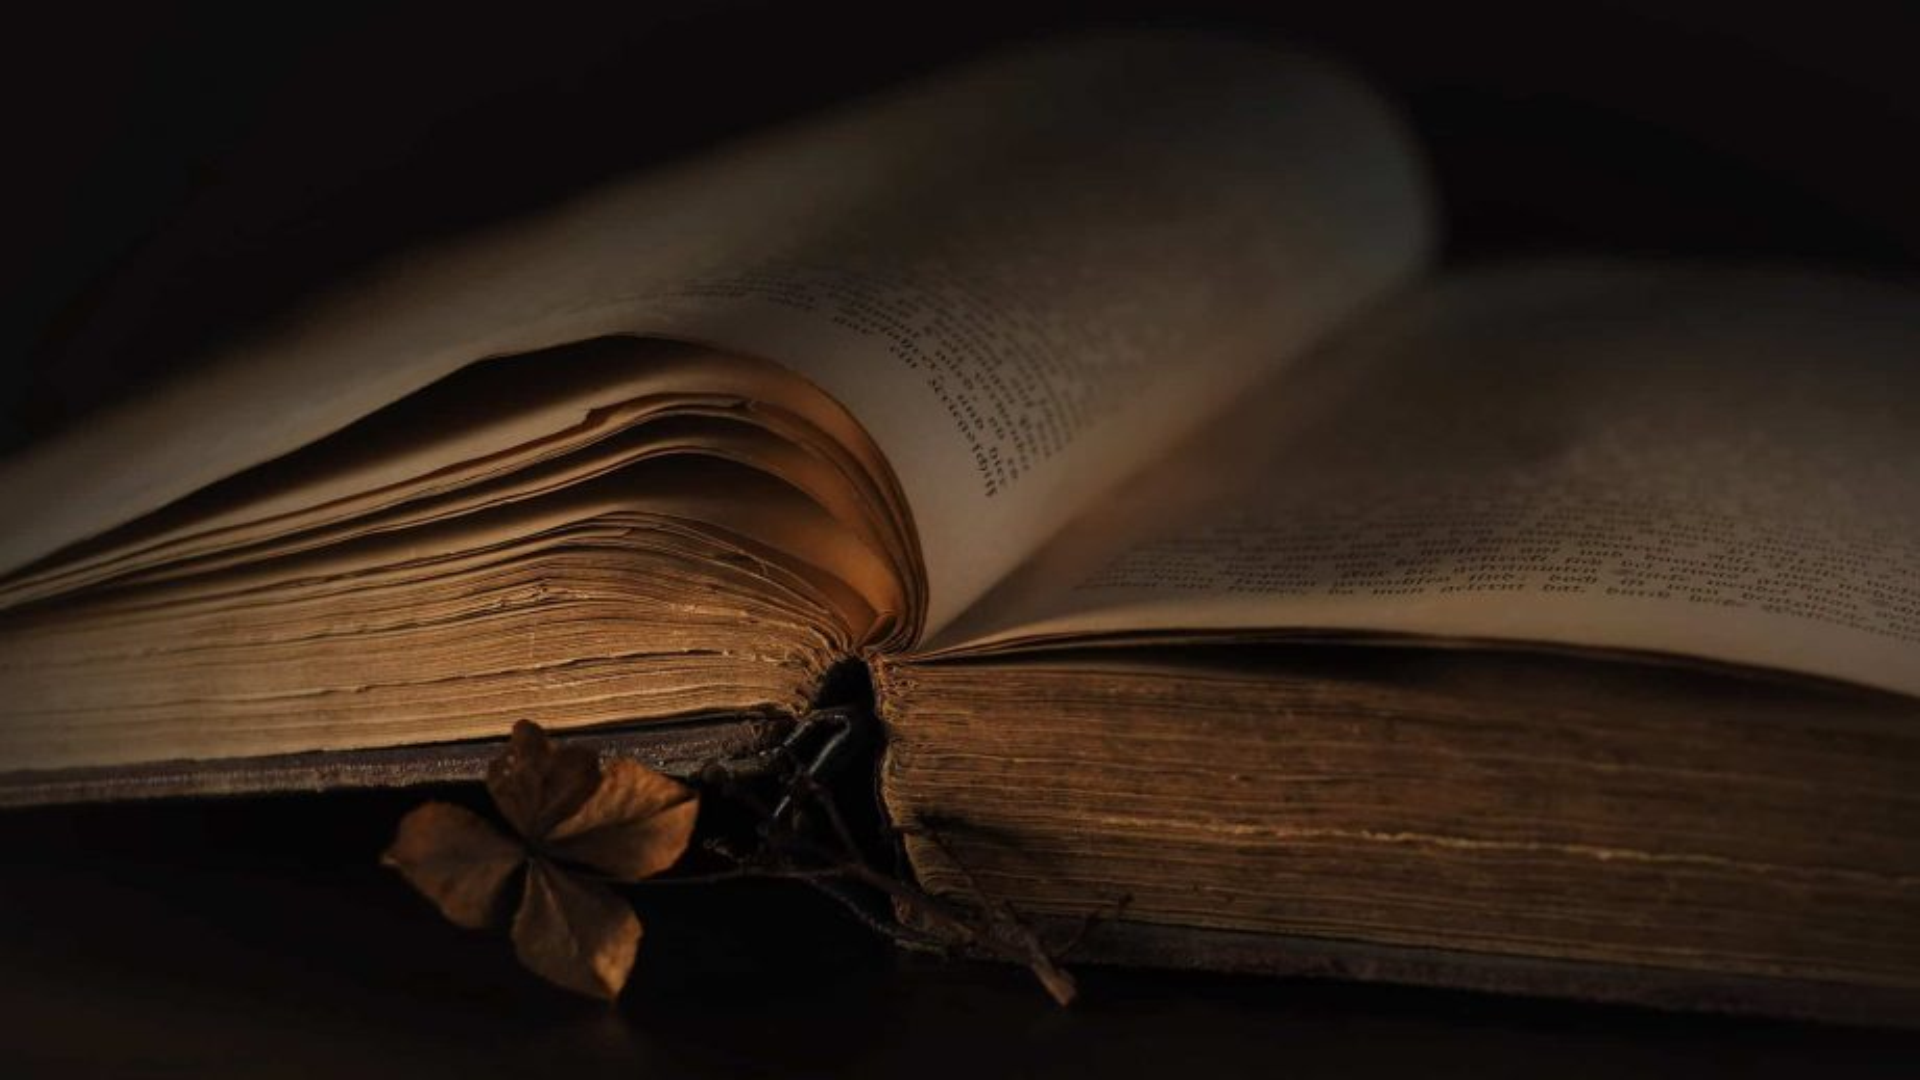 600 stolen books returned to University and Regional Library of Bonn